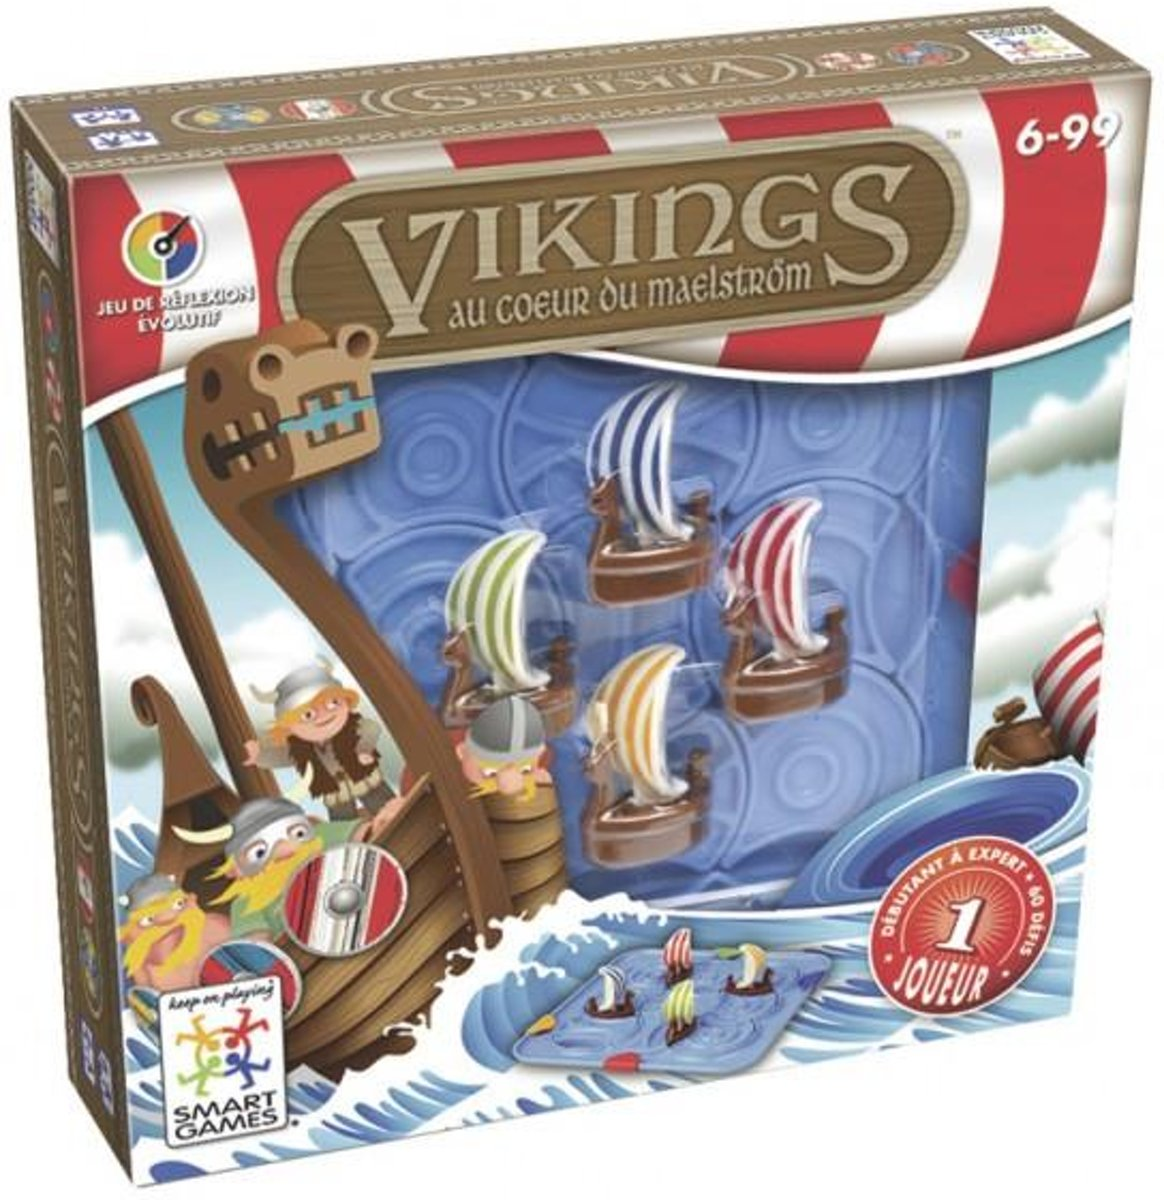 Smart Games Spel Vikings